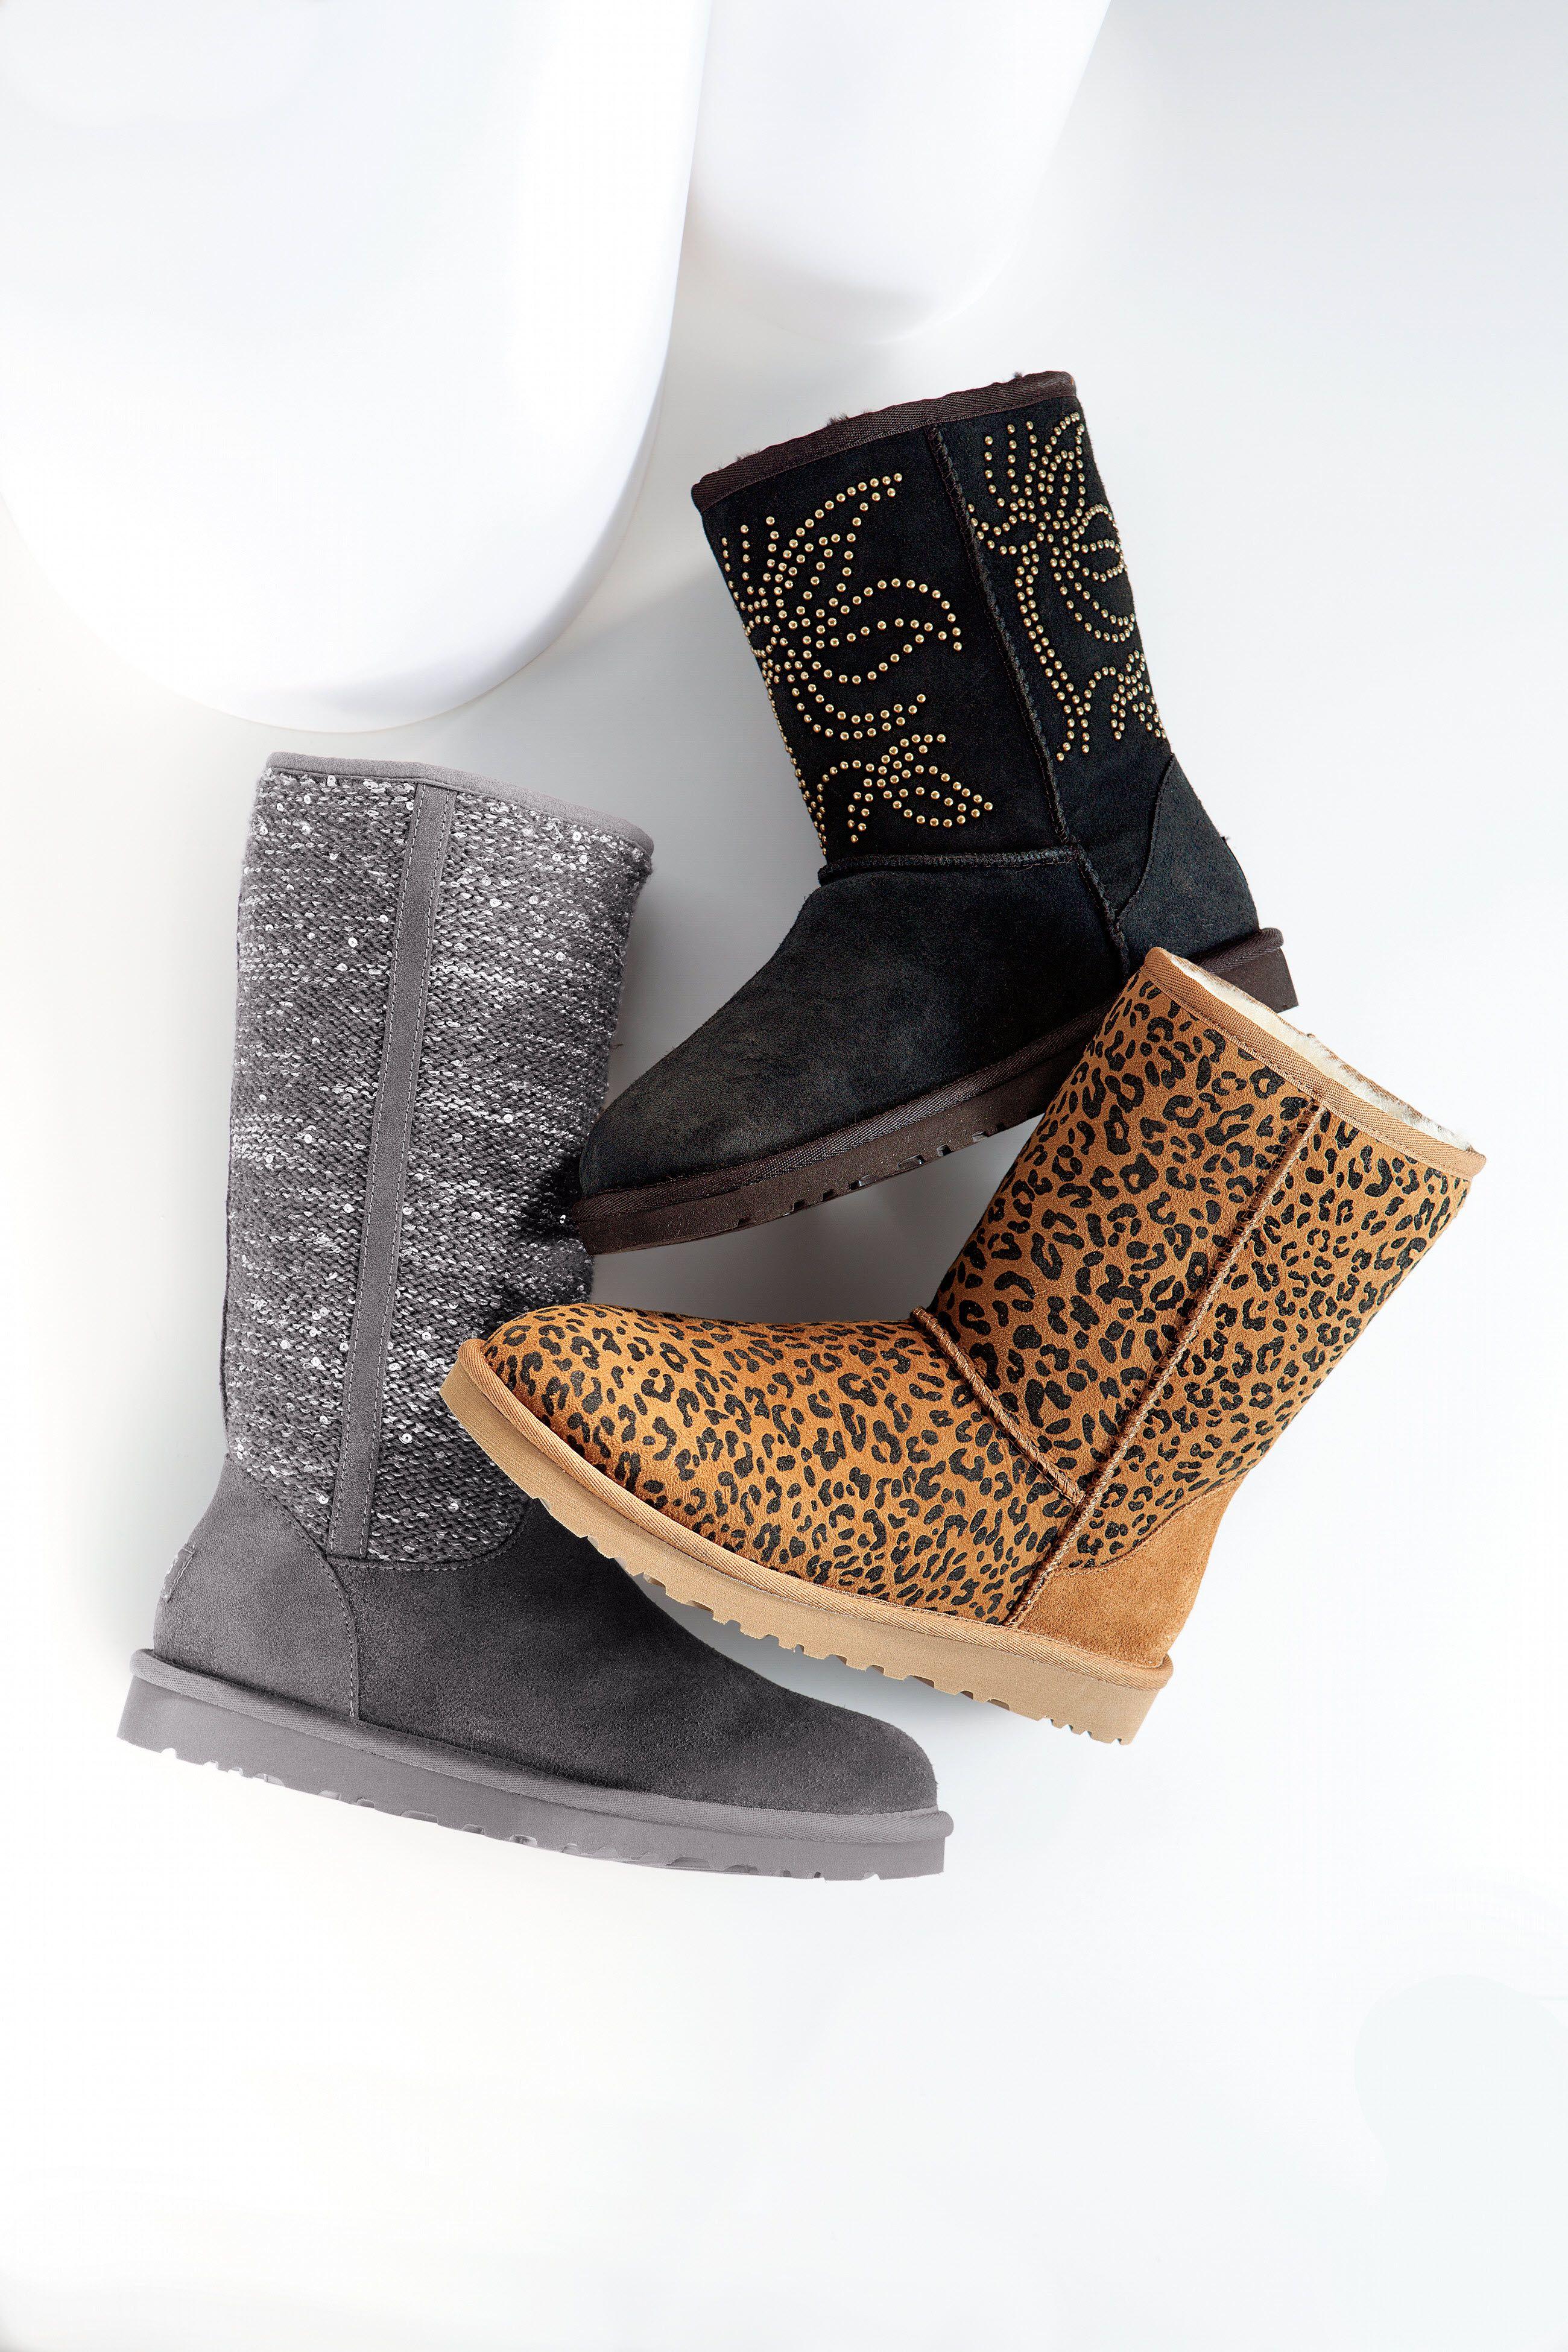 Belk.com | Fashion shoes, Boots, Uggs